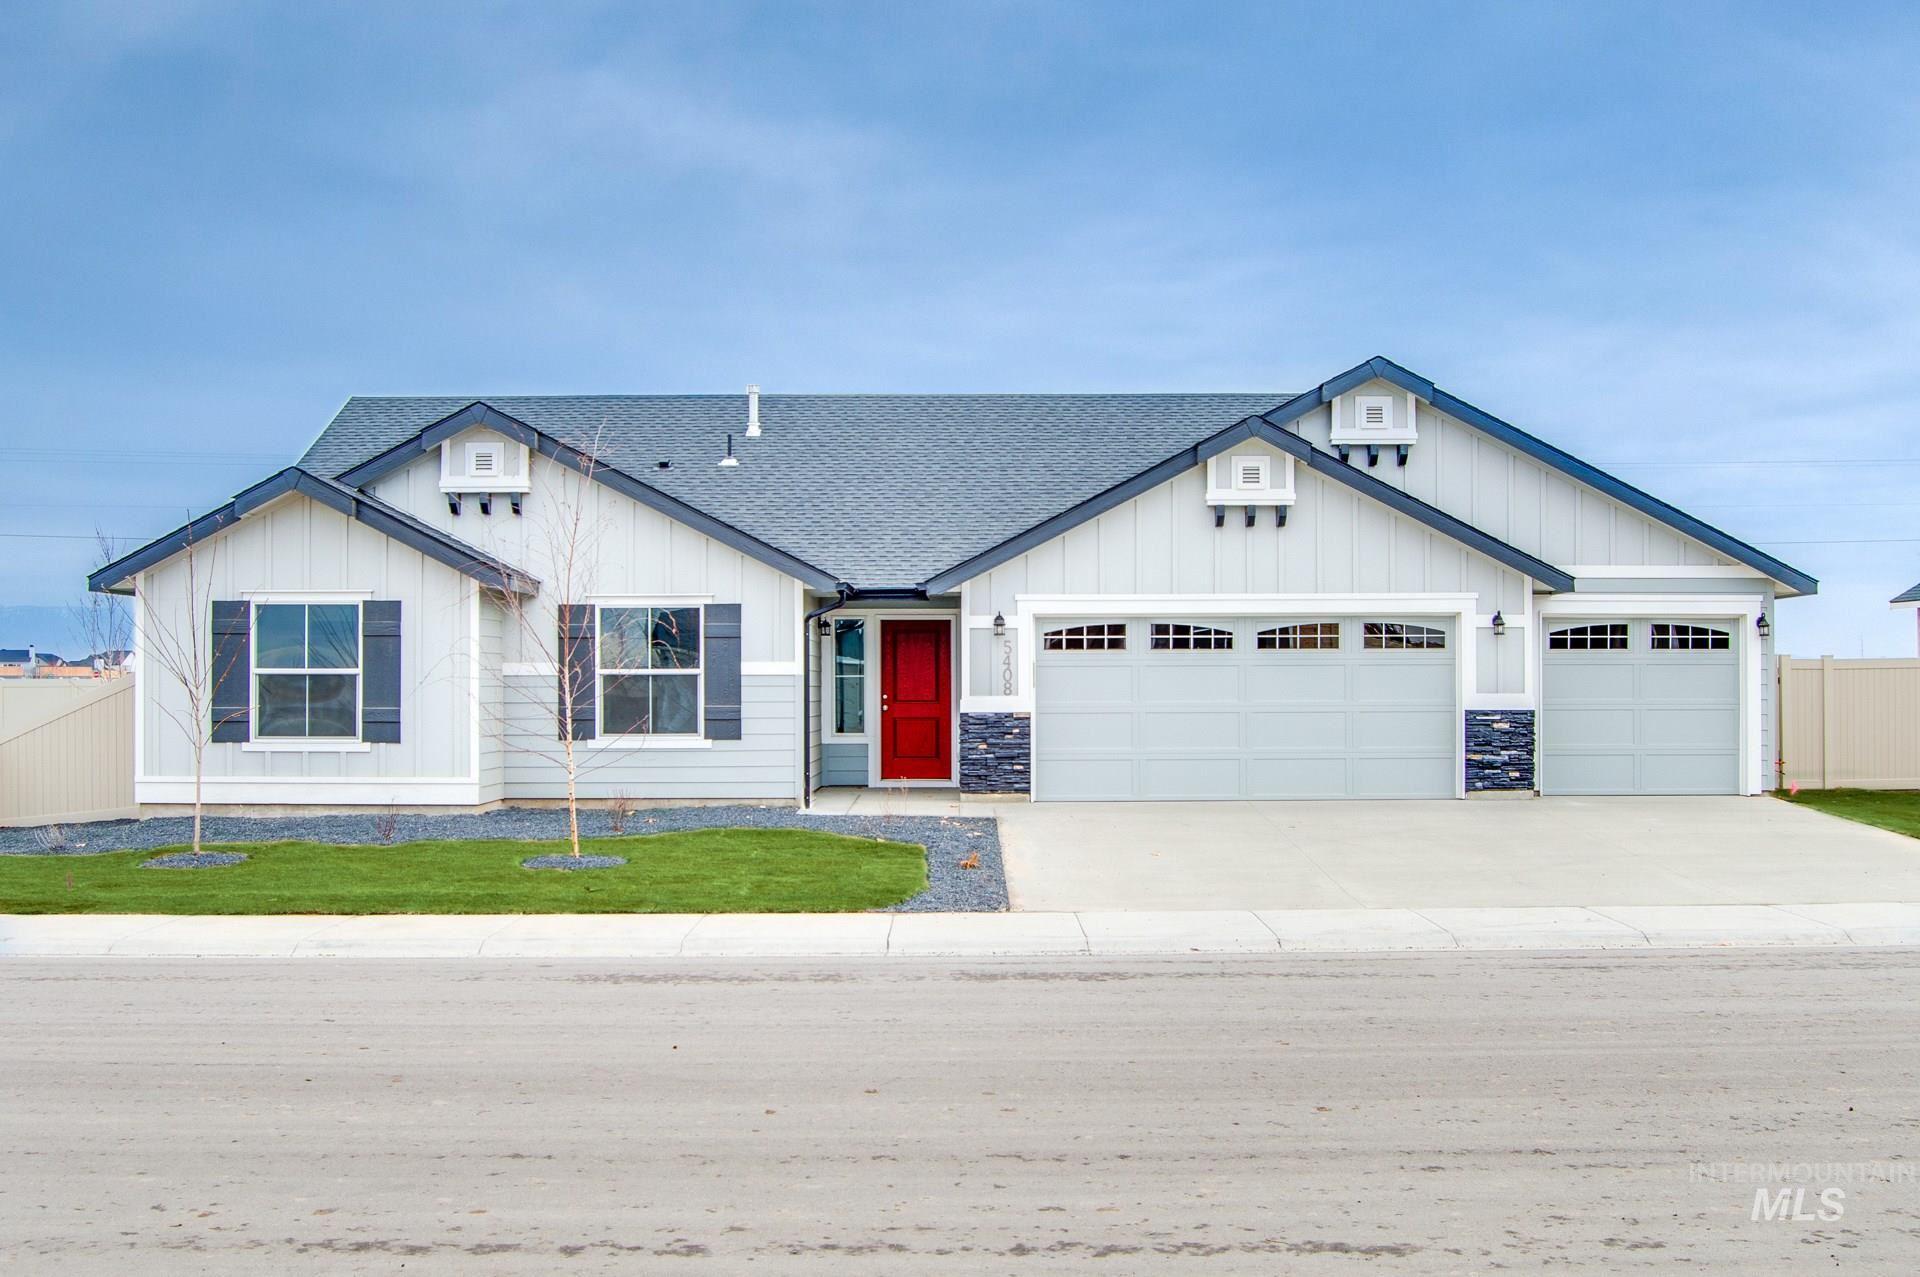 Photo of 1710 SW Gabar Ct, Mountain Home, ID 83647 (MLS # 98798610)